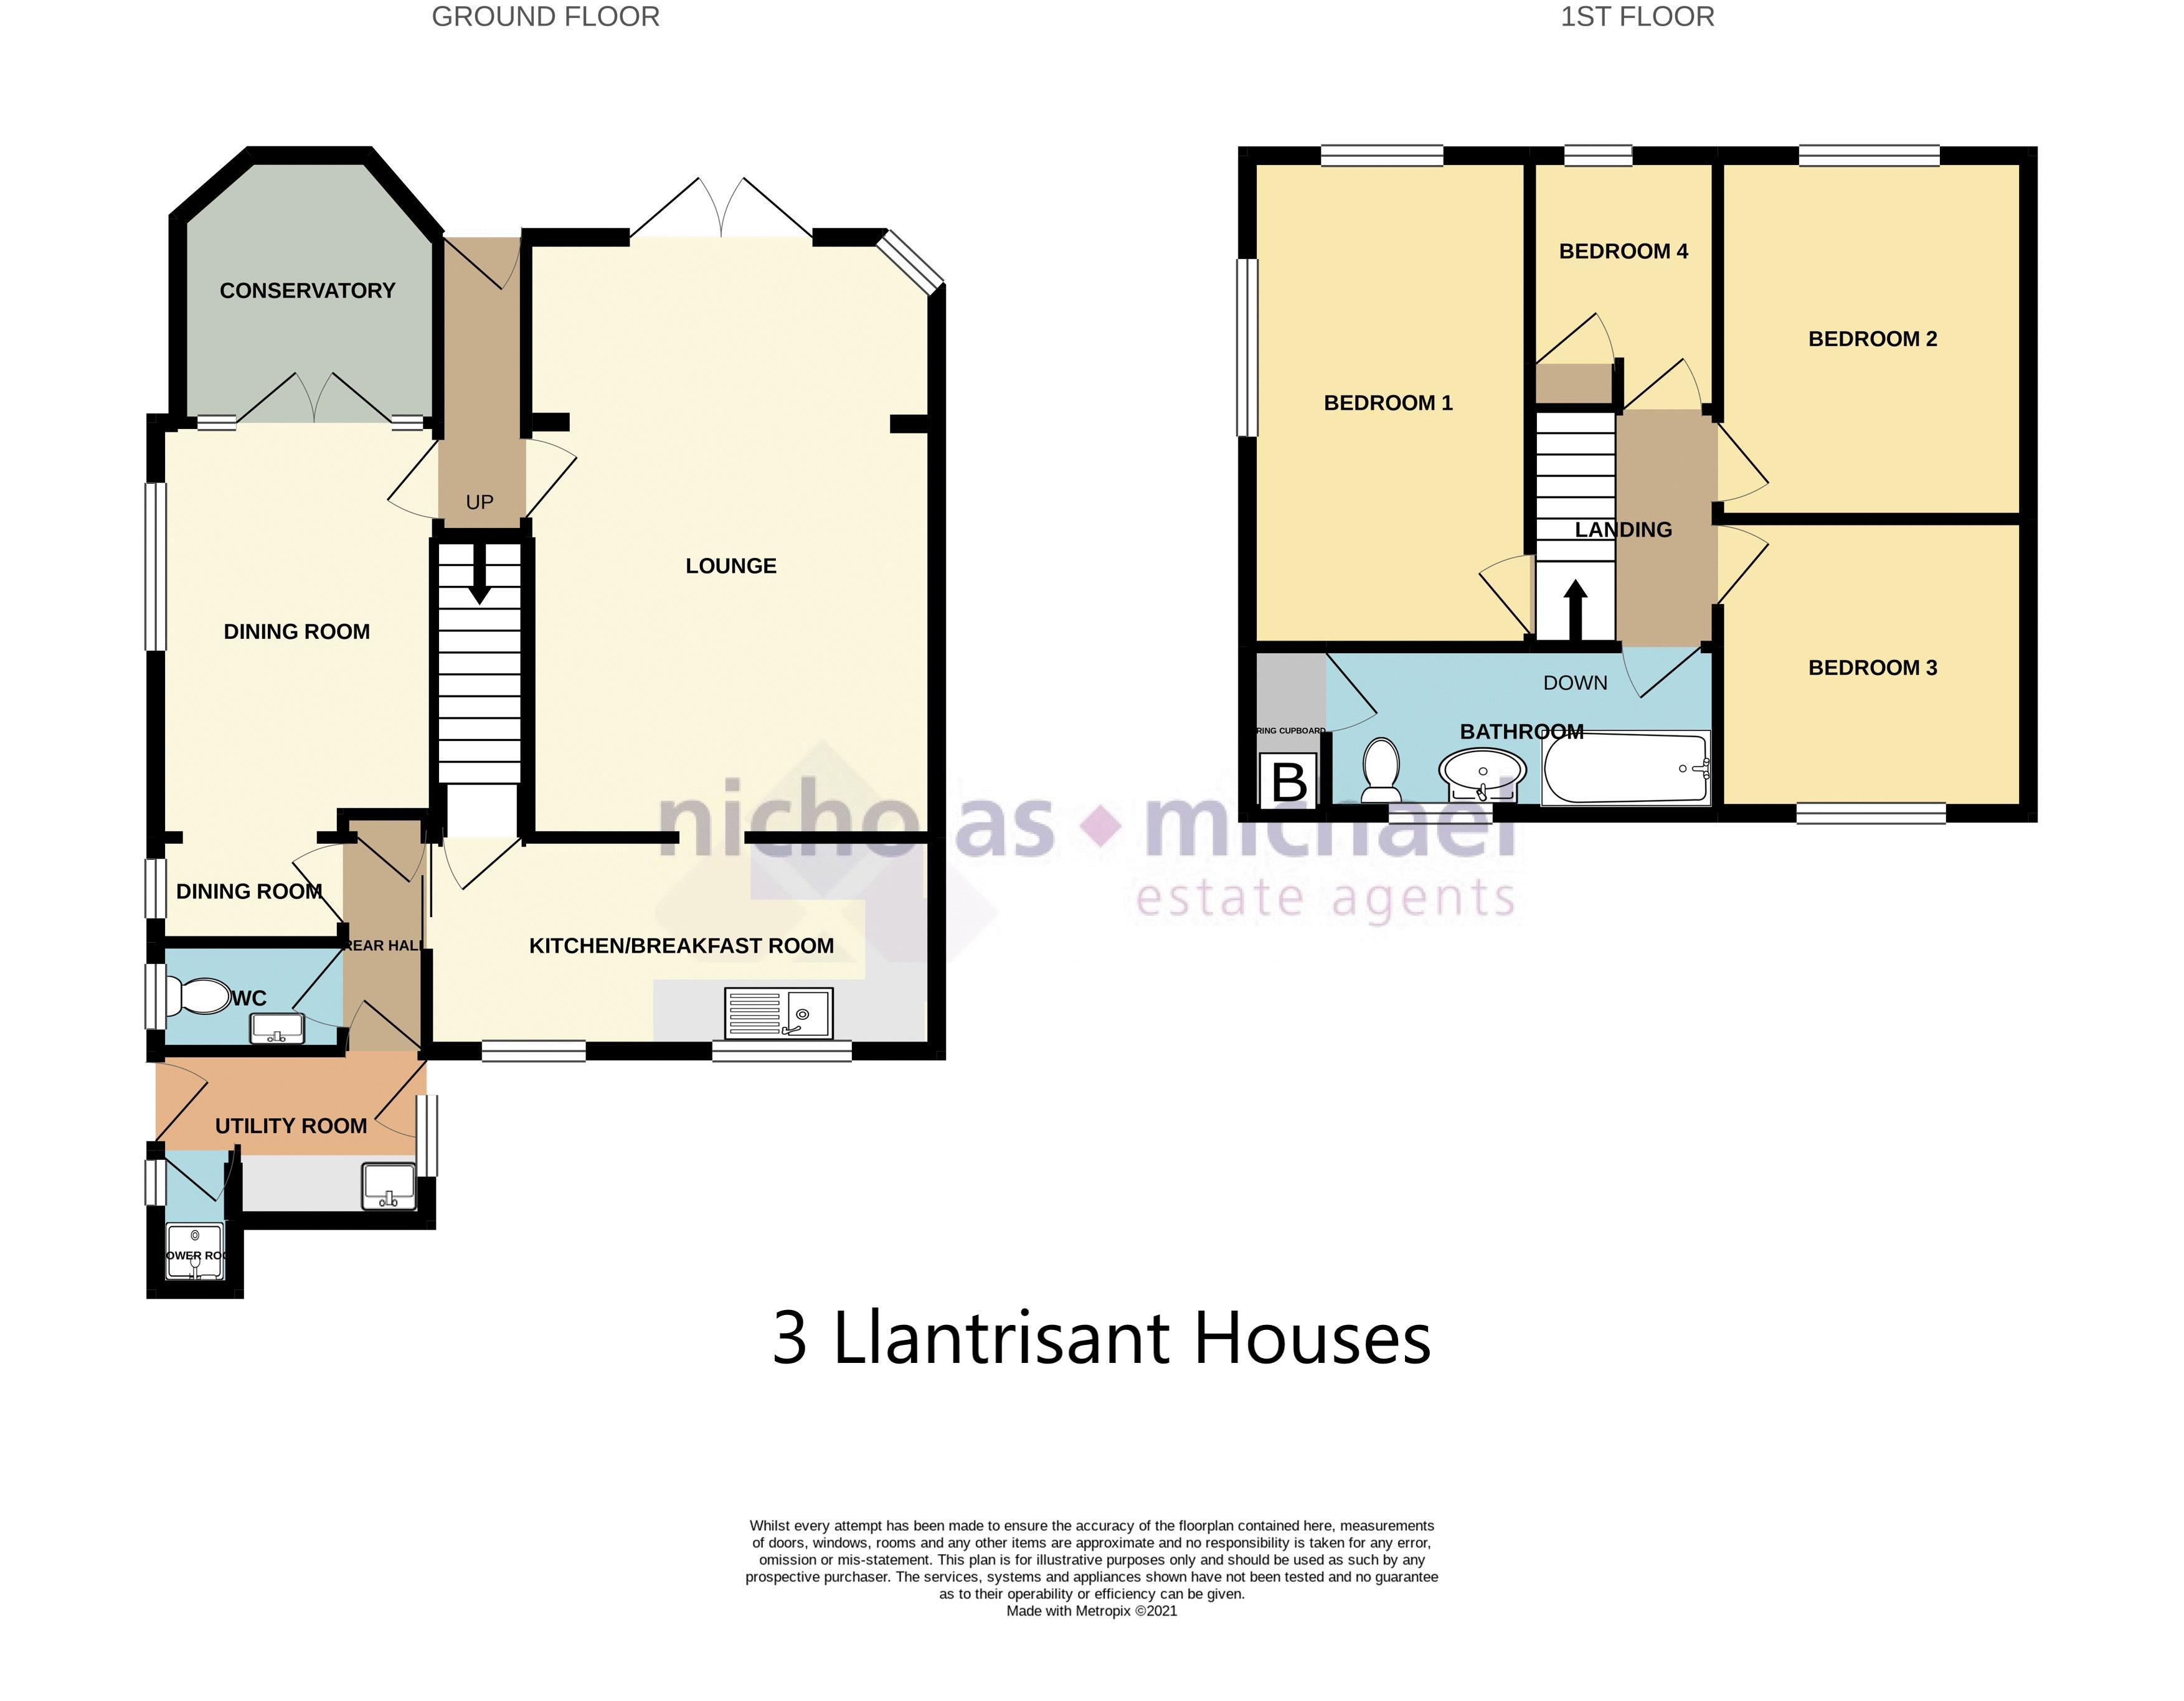 Llantrisant Houses